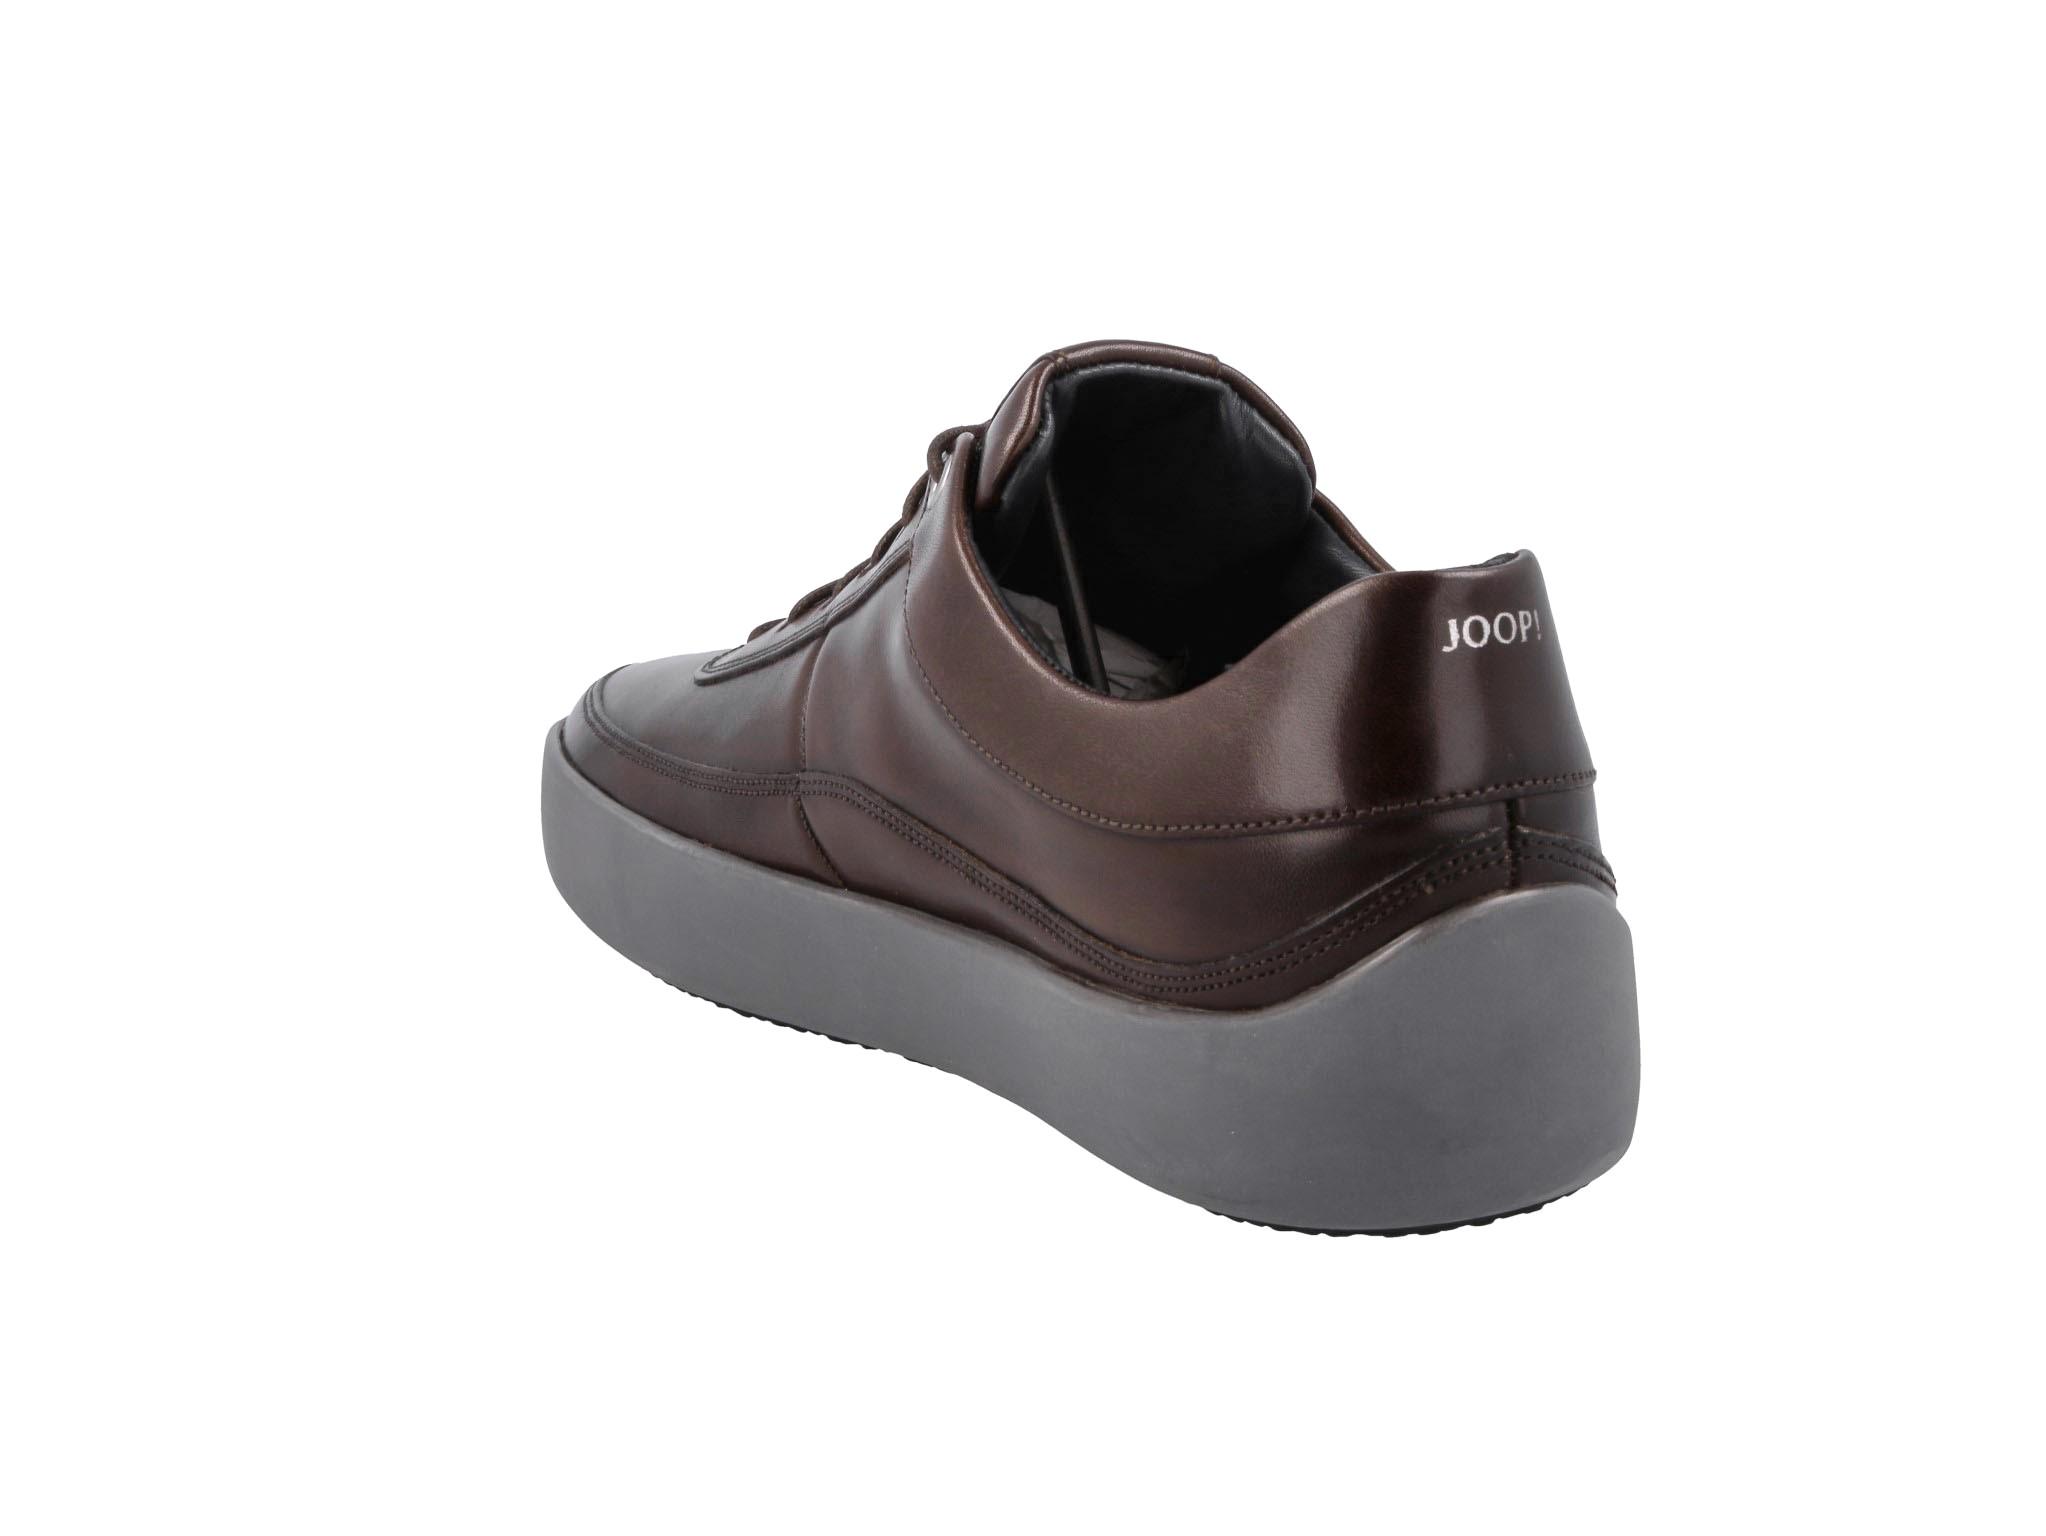 85109c405e963e Nikita 4140004185 Testa Di Moro 704 Sneakersy JOOP! - Nikita 4140004185 Testa  Di Moro 704 ...